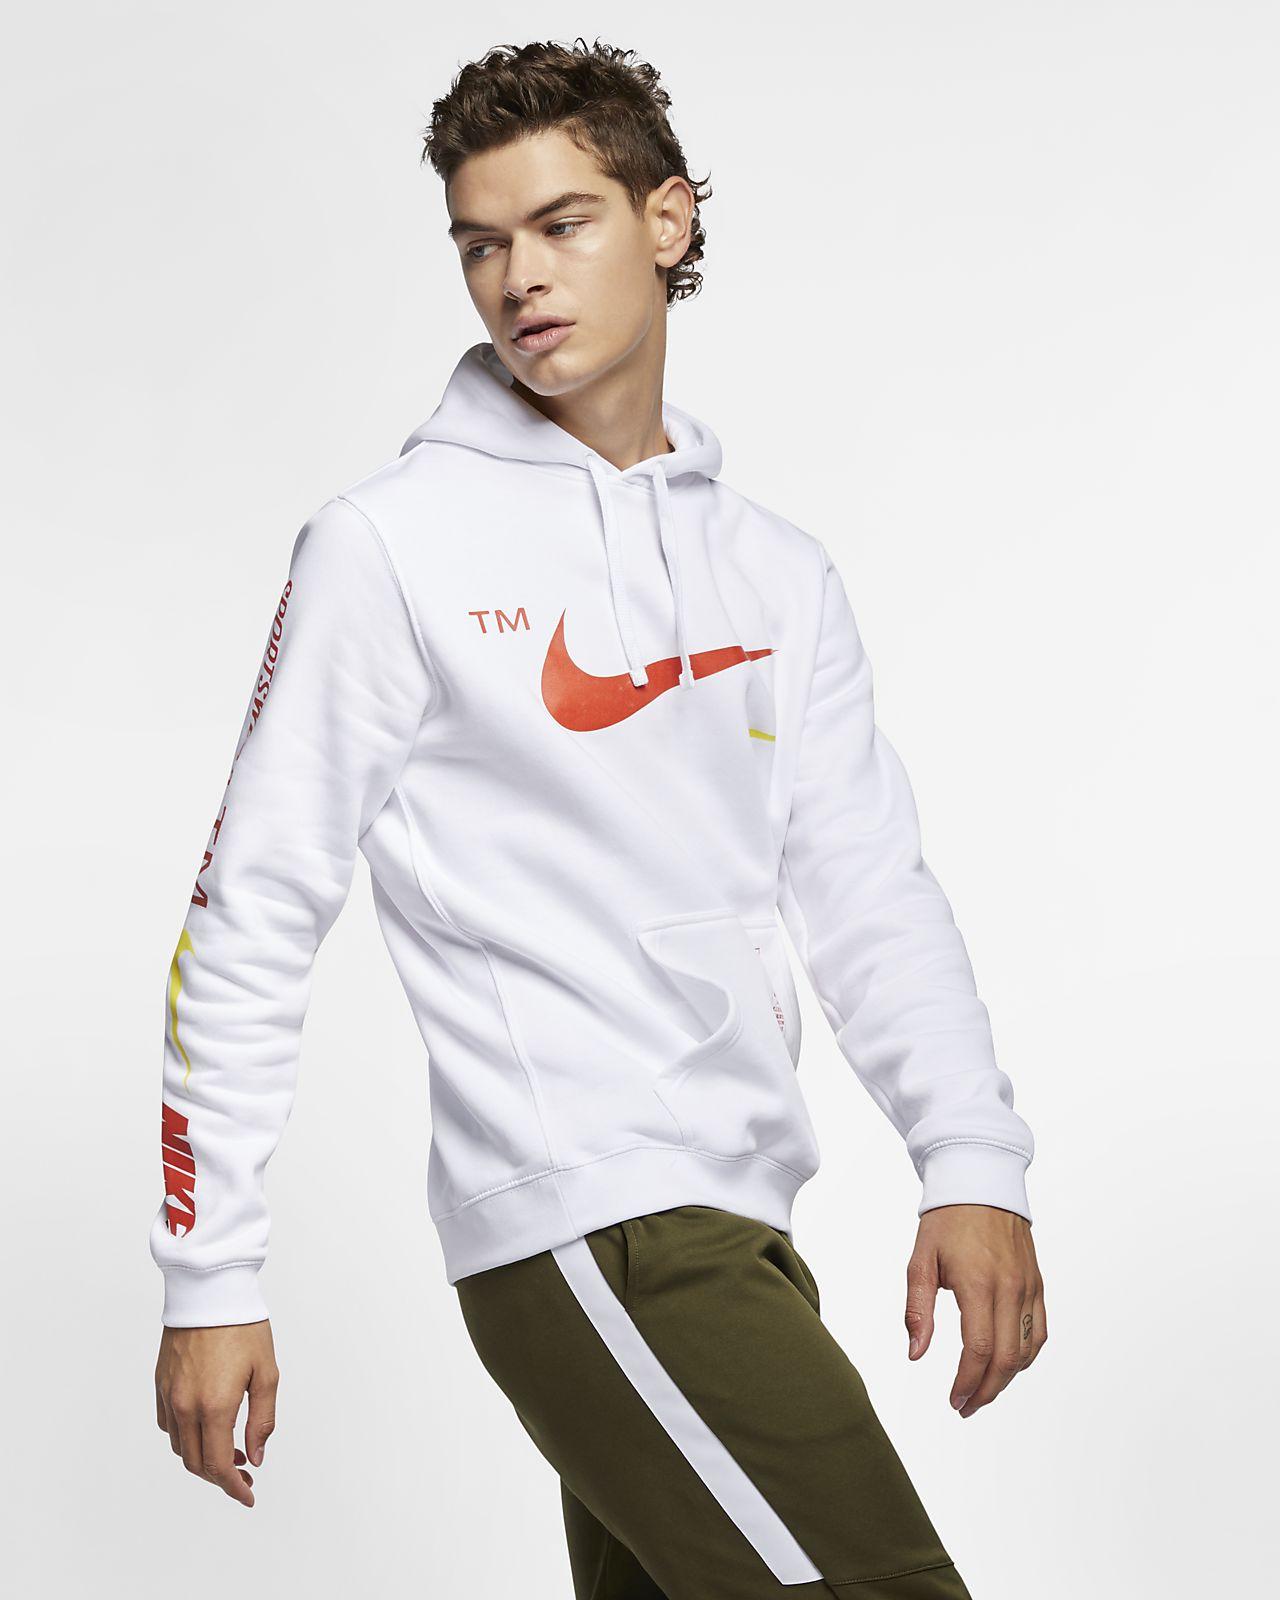 70586110ecd4 Low Resolution Nike Sportswear Club Pullover Hoodie Nike Sportswear Club  Pullover Hoodie